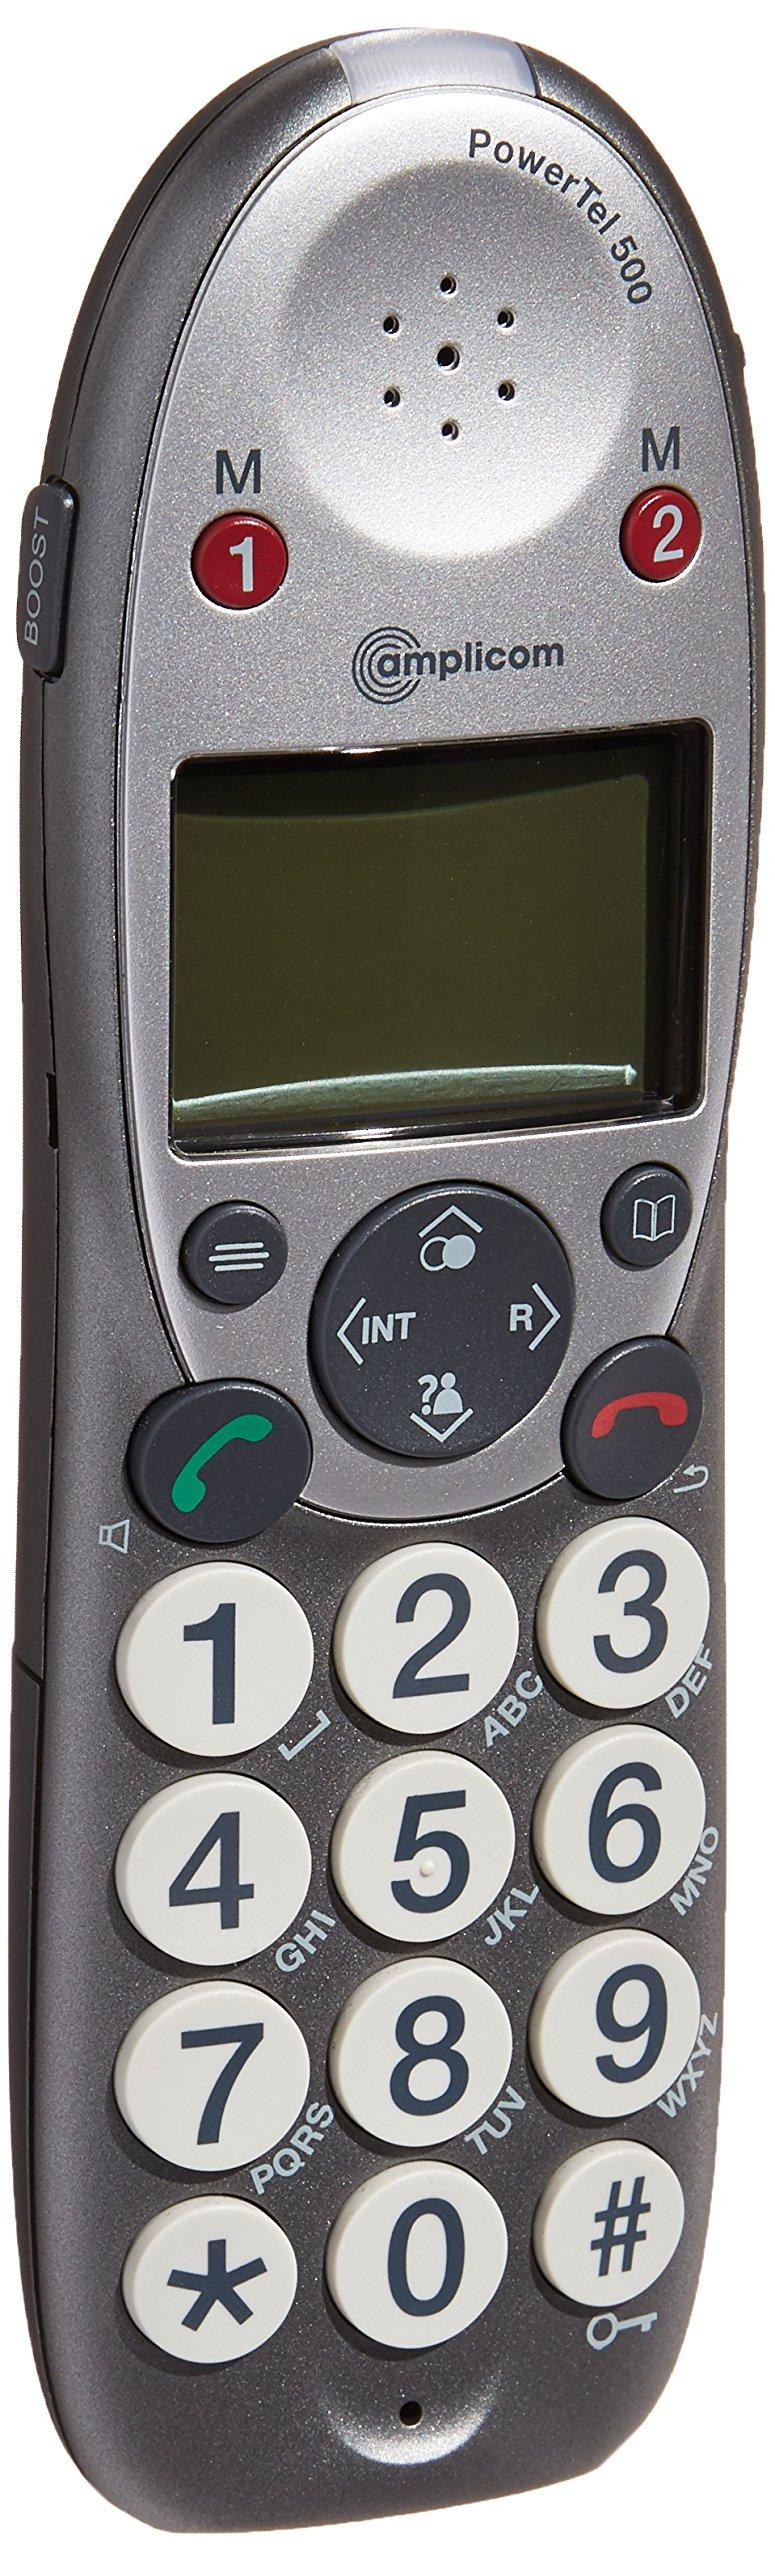 Amplicom PowerTel 501 Dect 6.0 1-Handset